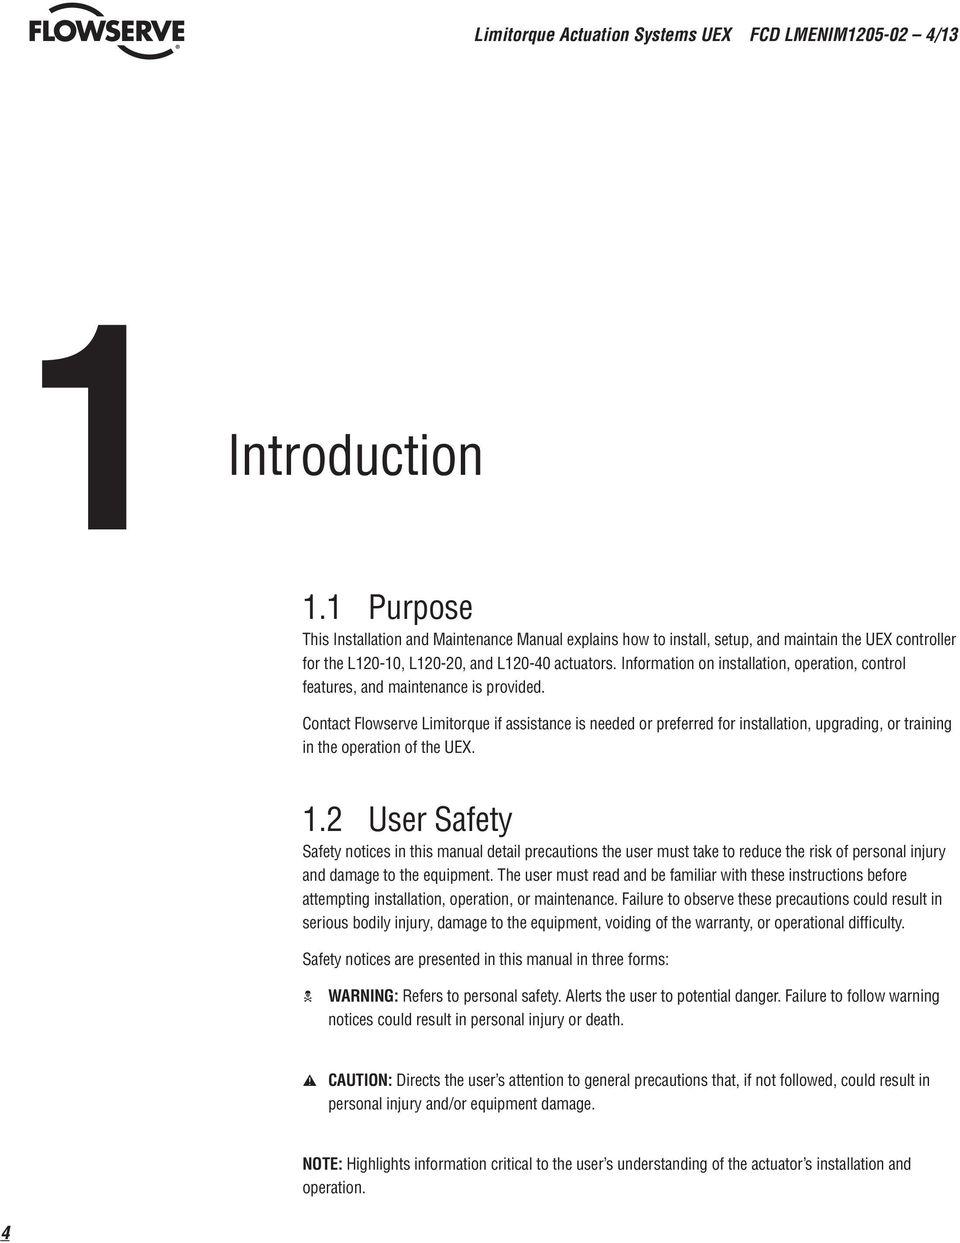 Flowserve Wiring Diagram Online Schematics Limitorque Mx 20 Actuators General Safety Installing Genesis Sullair